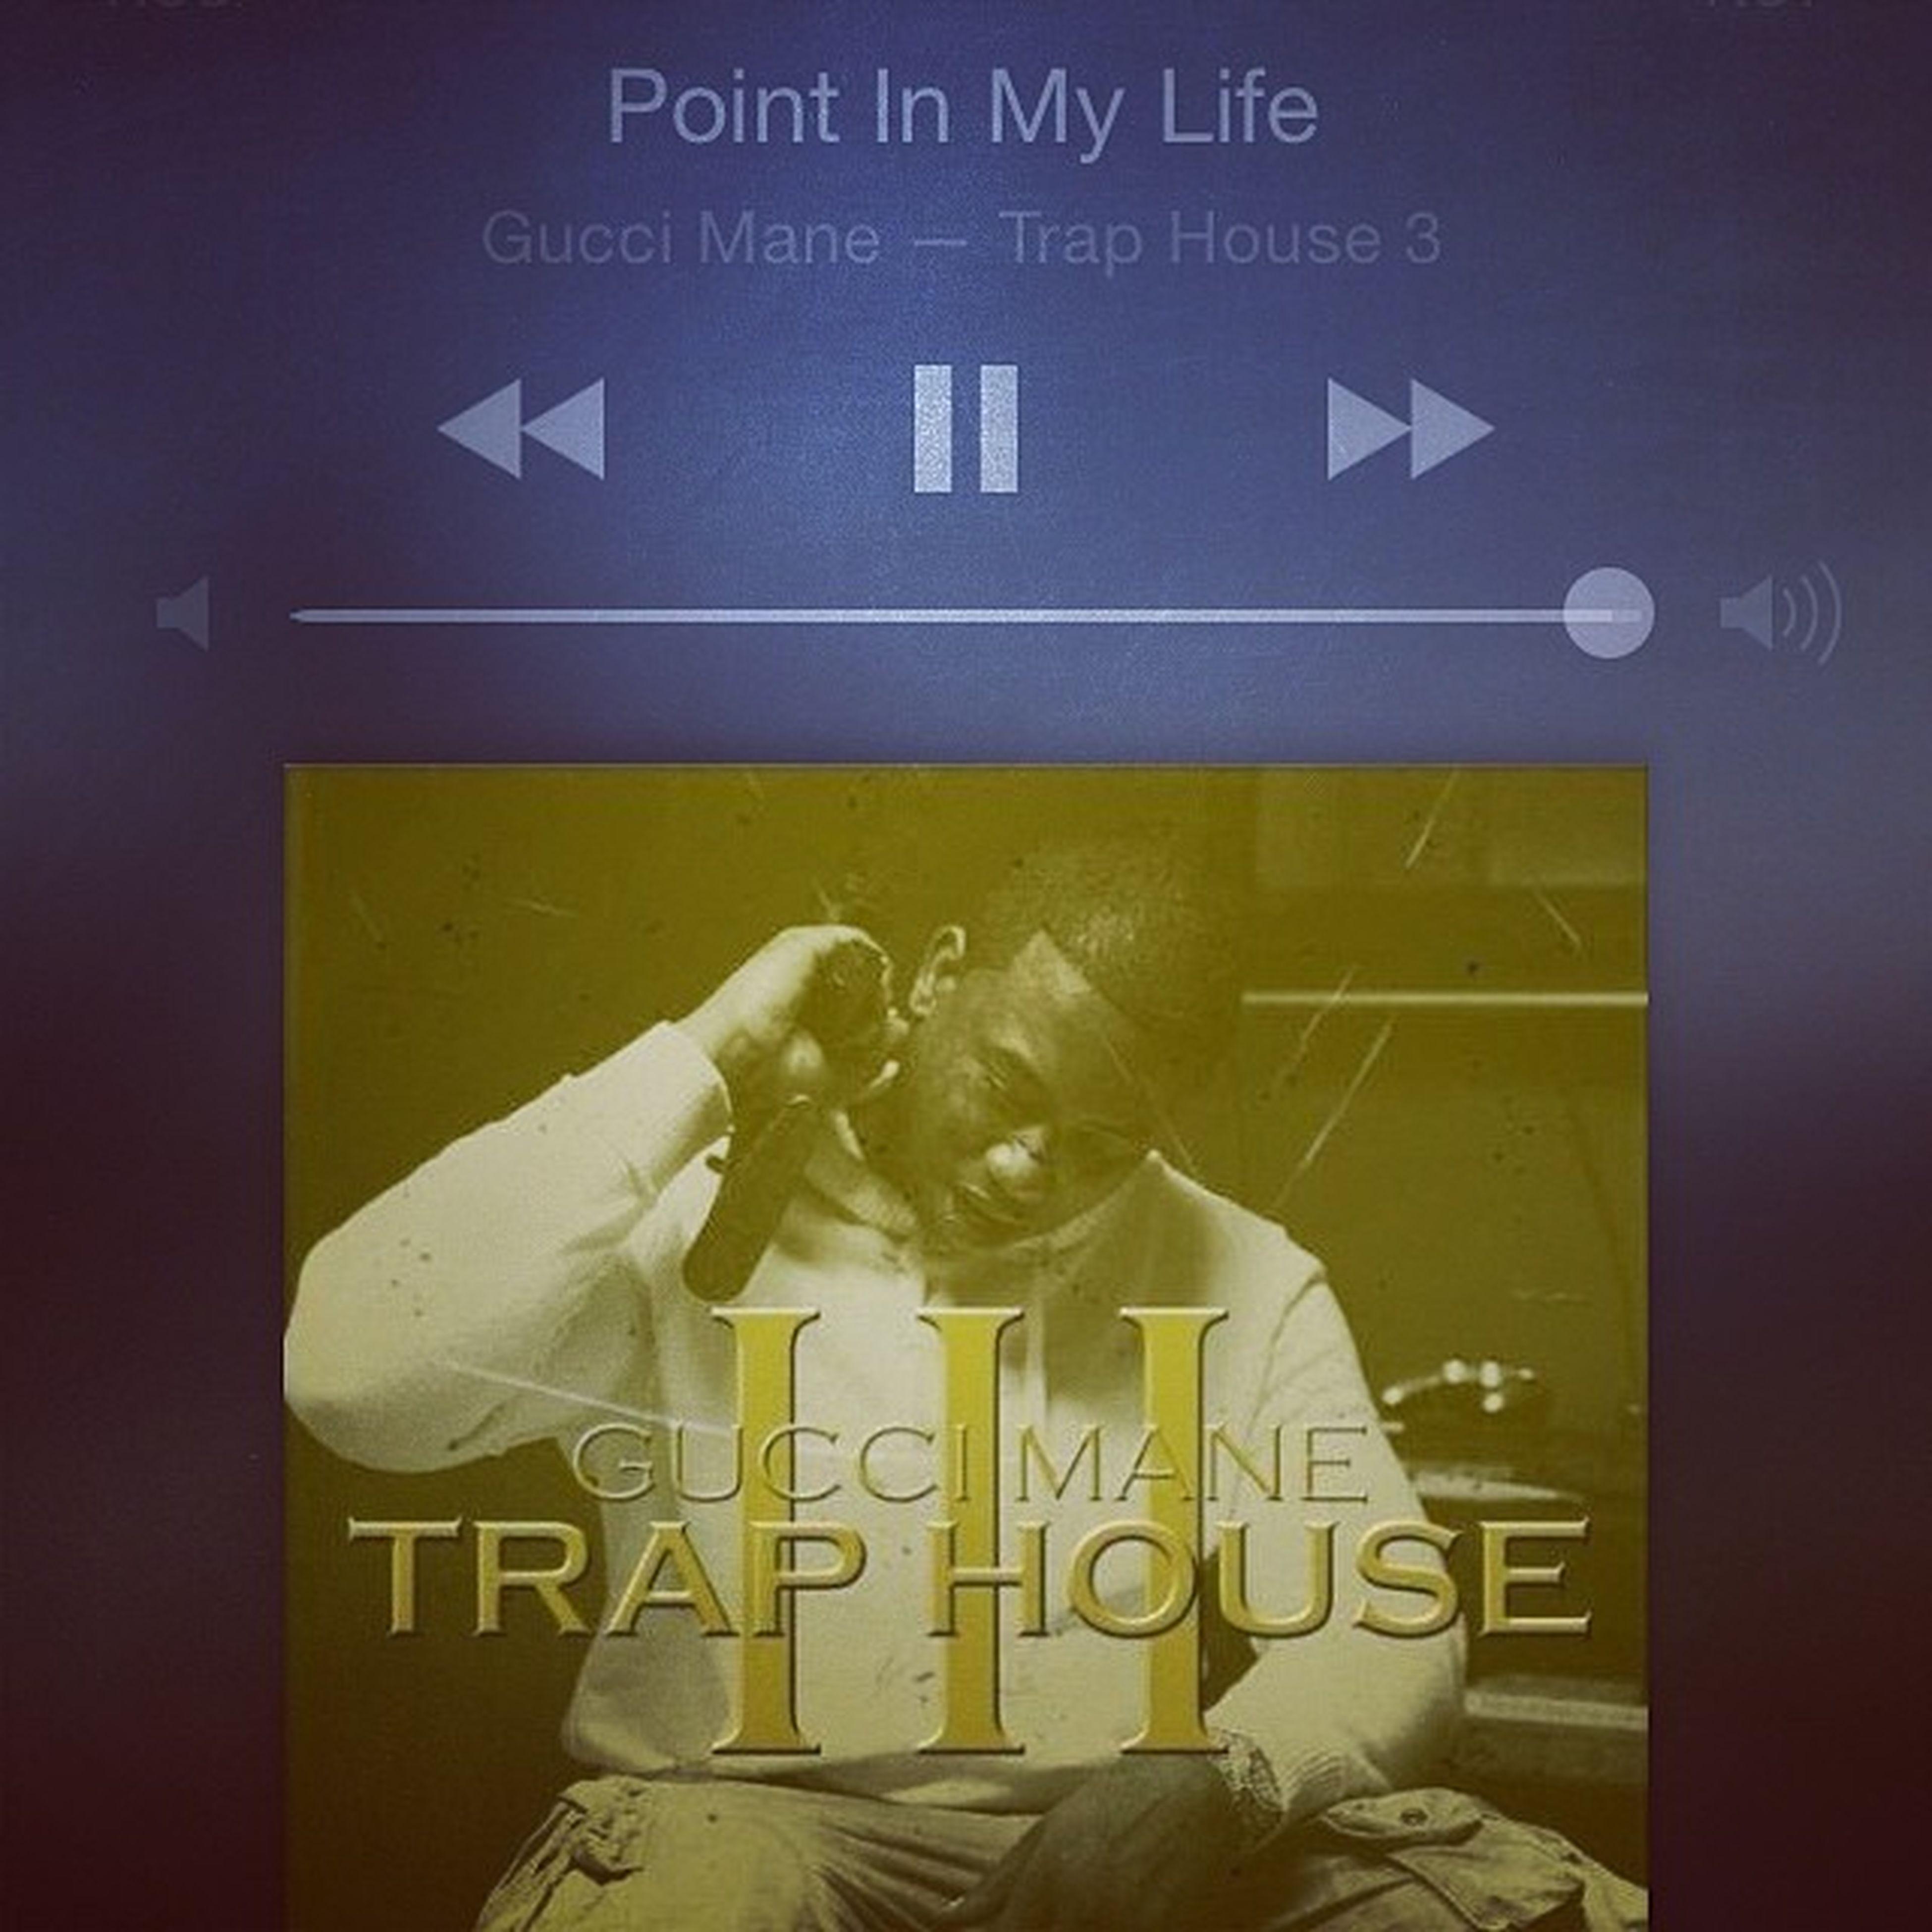 Trap house 3 Gucci Myanthem